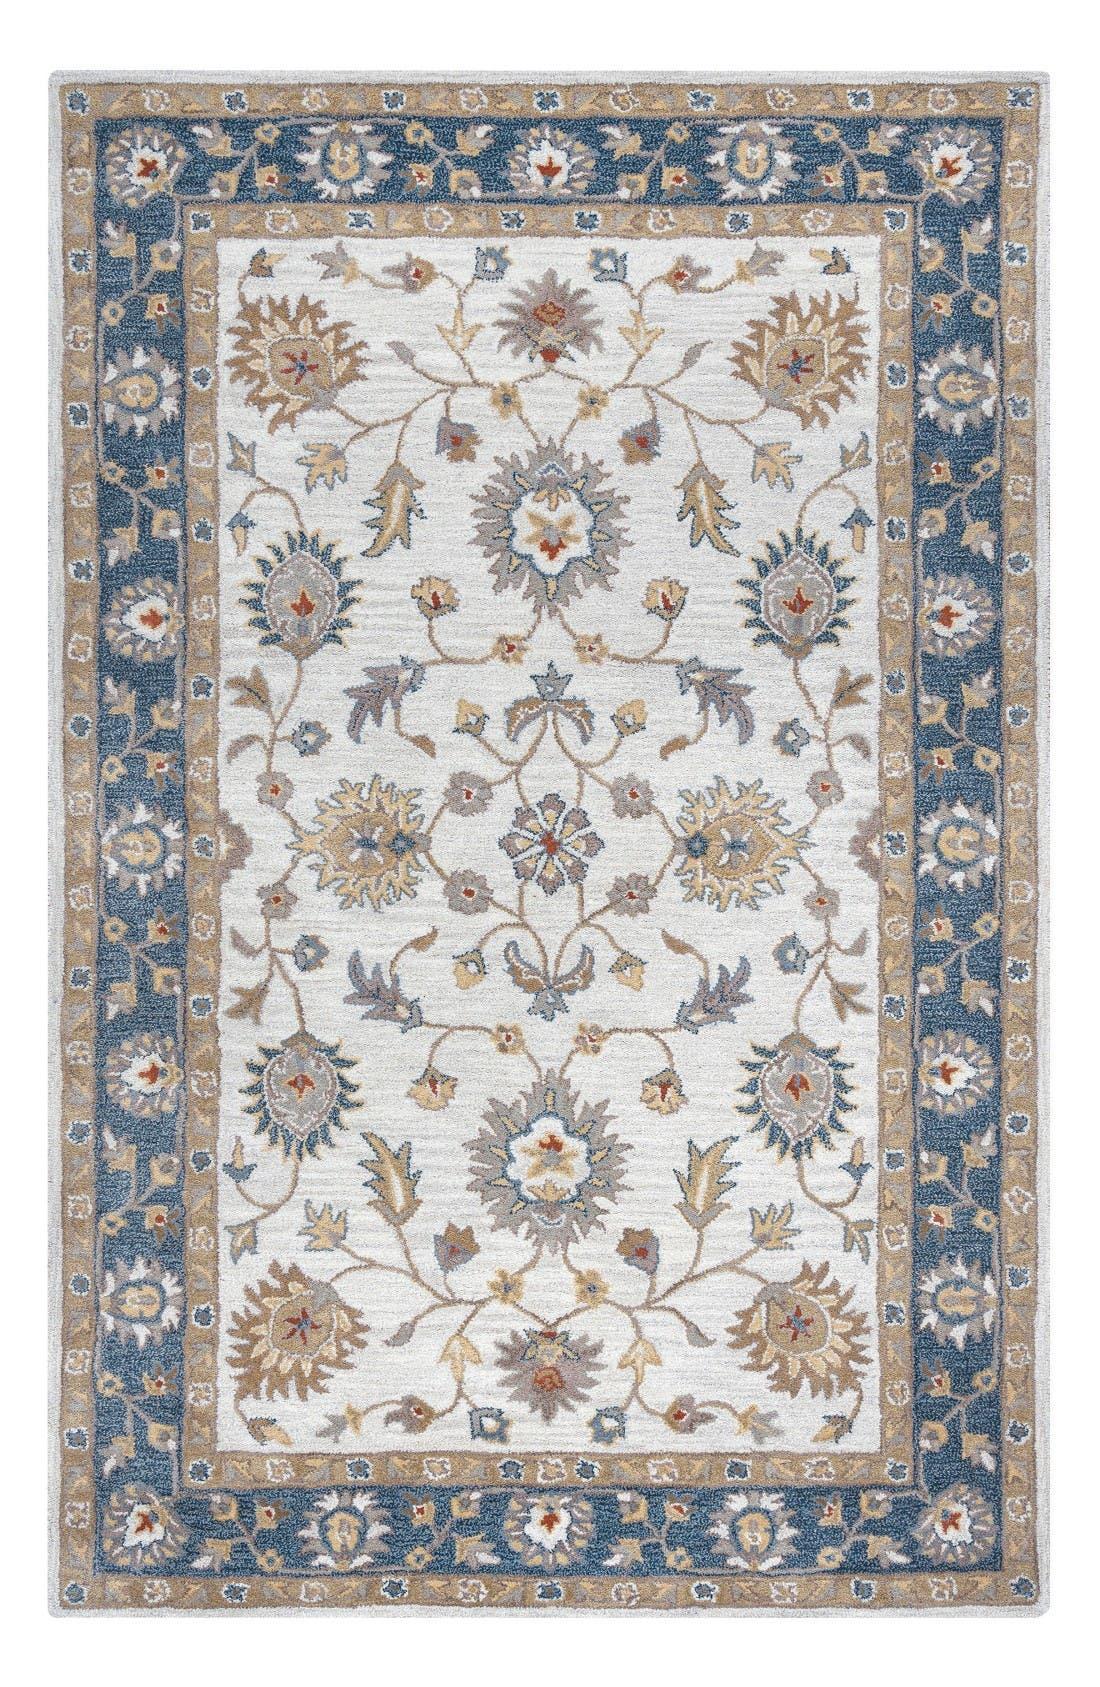 Main Image - Rizzy Home 'Valintino Border' Hand Tufted Wool Area Rug